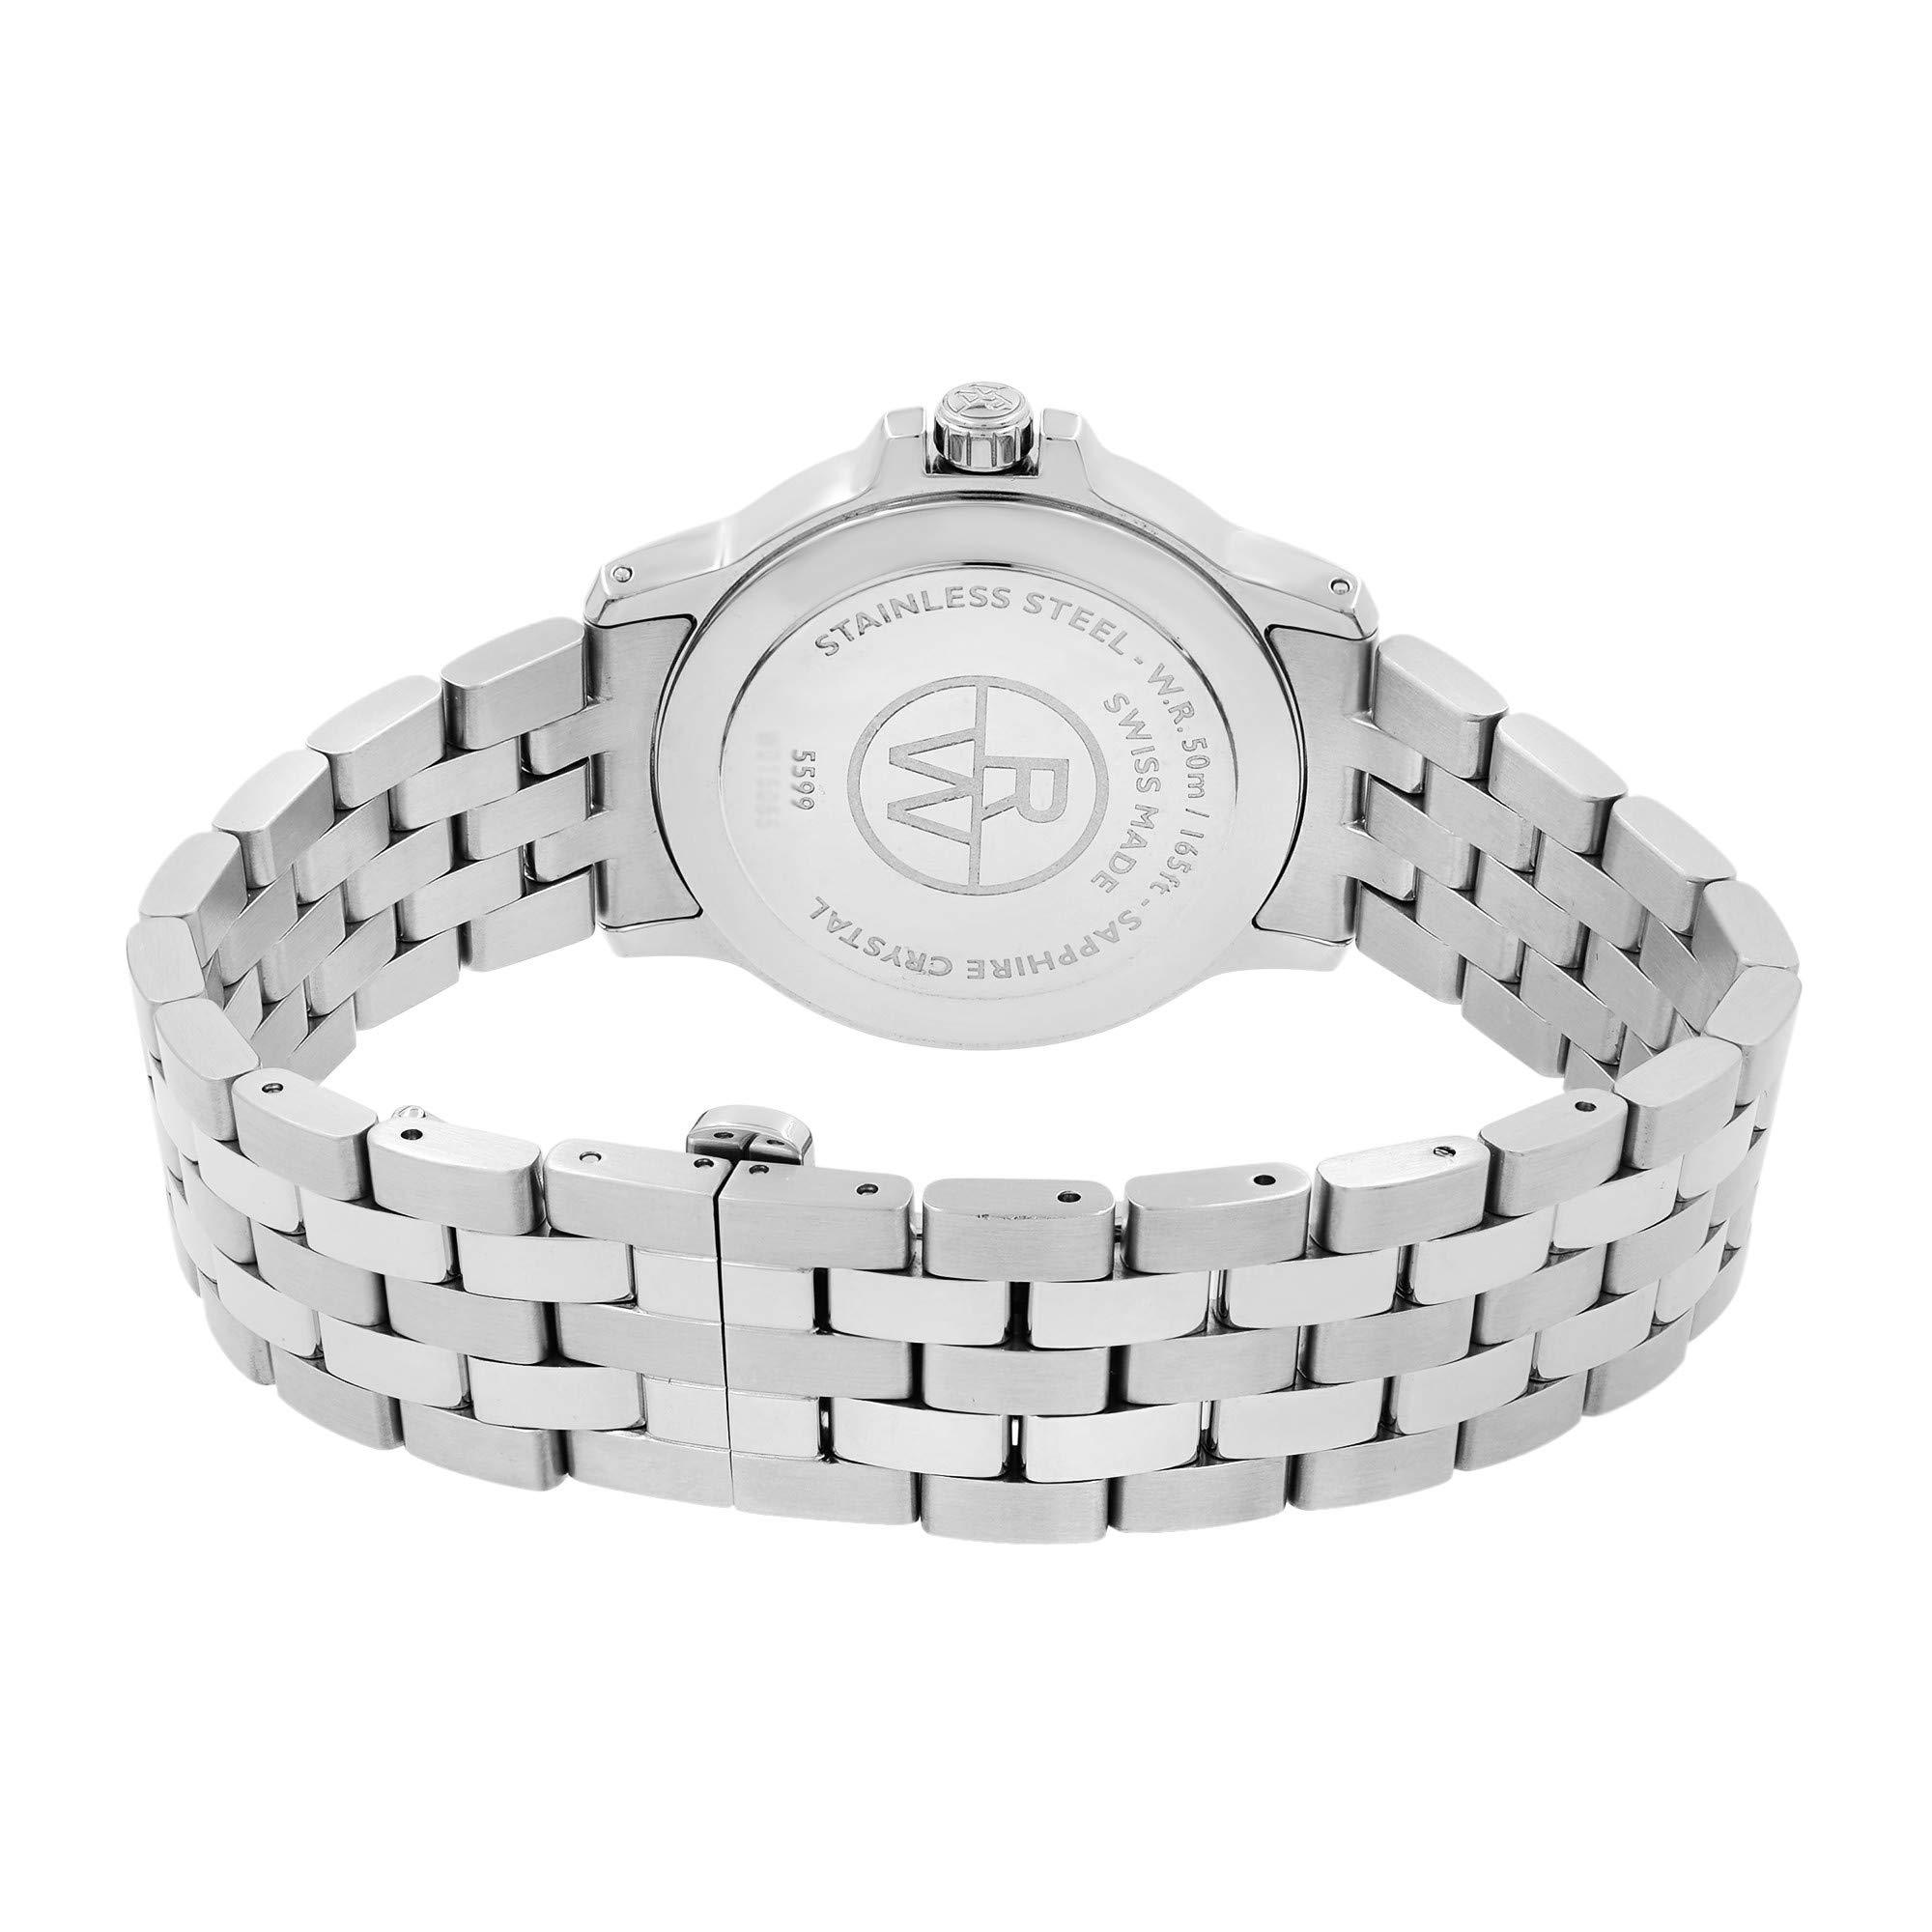 Raymond Weil Tango Quartz Male Watch 5599-ST-00658 (Certified Pre-Owned) by RAYMOND WEIL (Image #2)